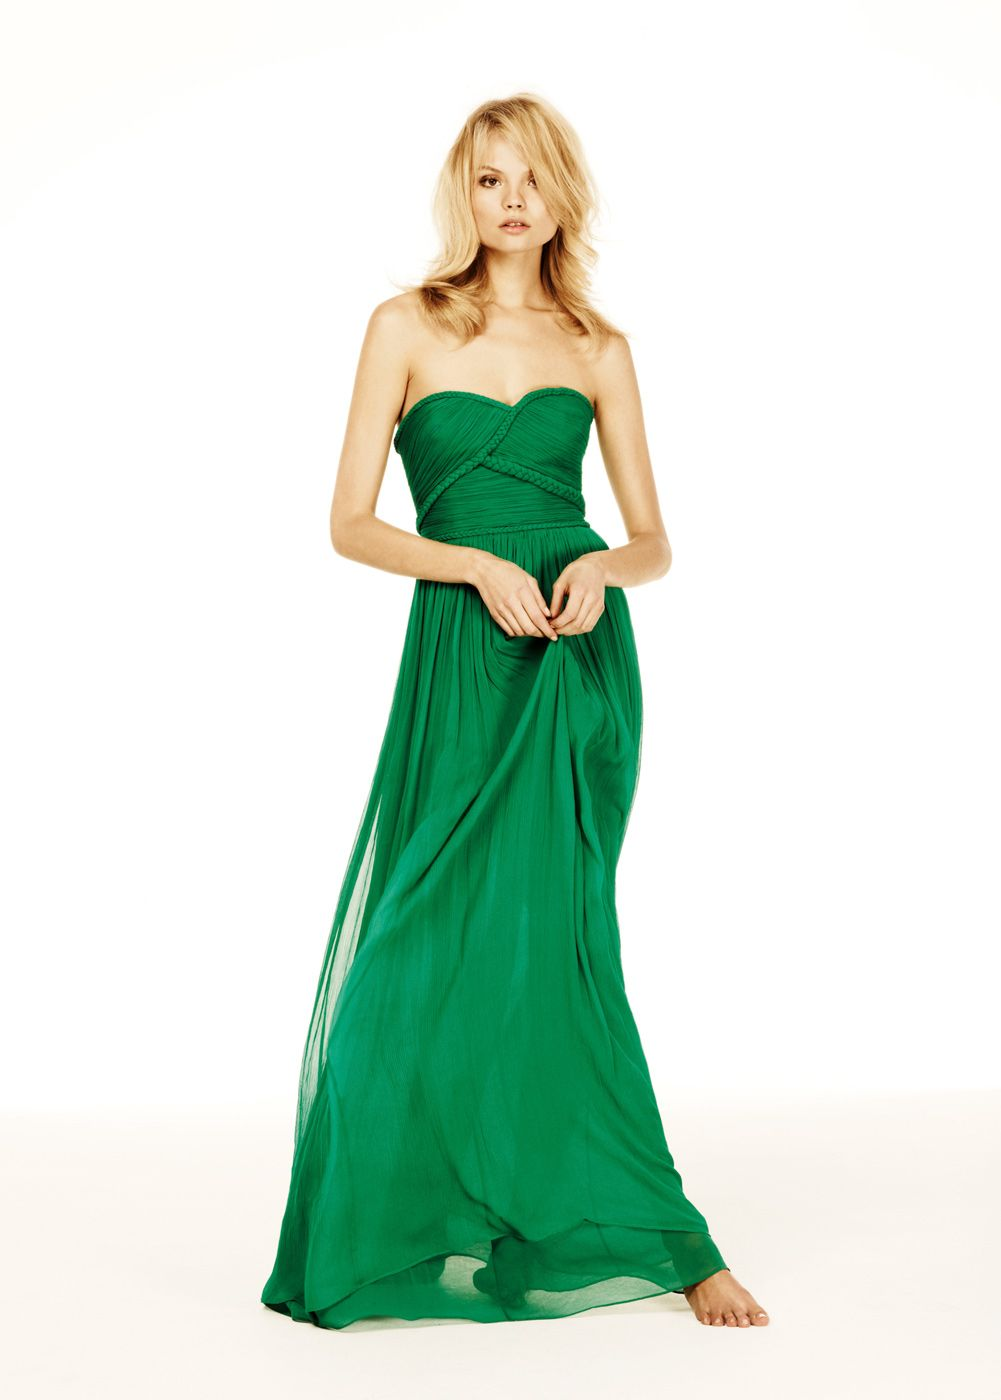 Green Maxi Dress Green Prom Dress Maxi Dress Green Long Green Dress [ 1400 x 1001 Pixel ]